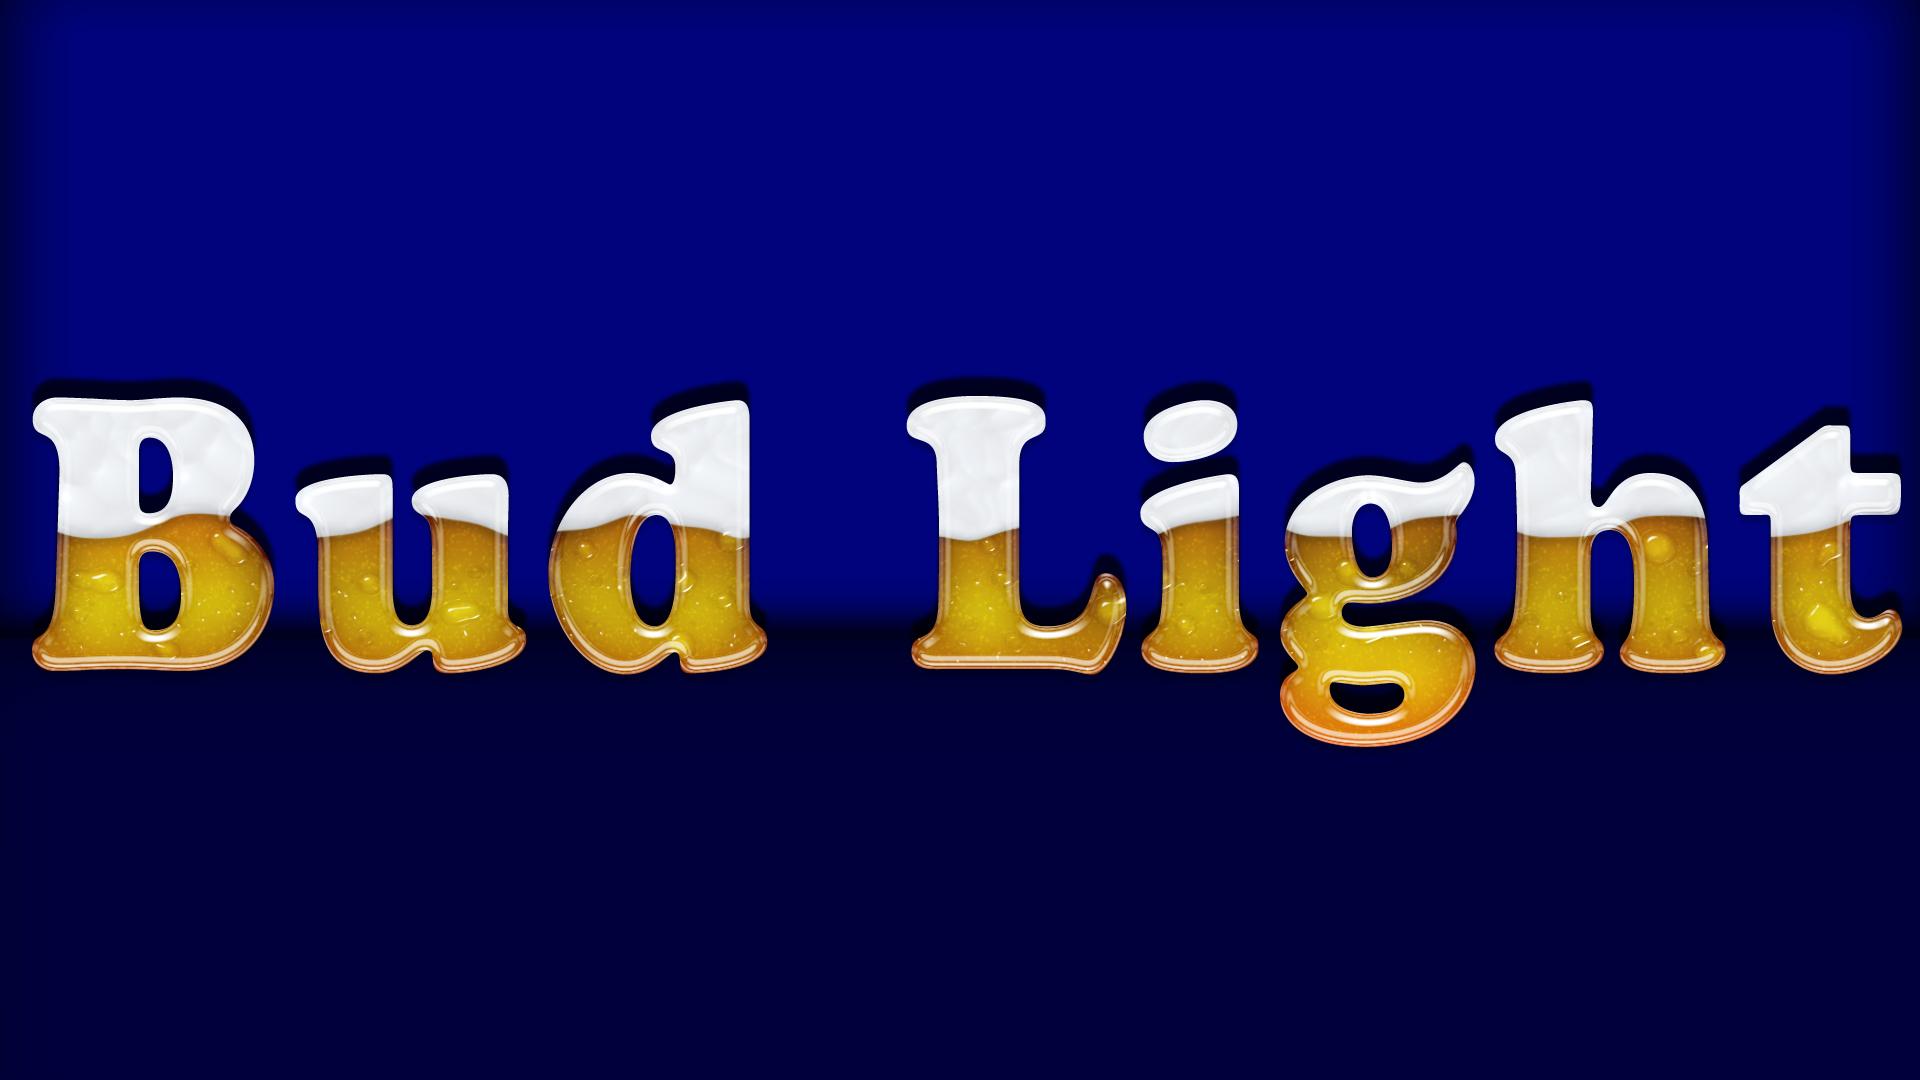 Bud Light Wallpaper 1920x1080